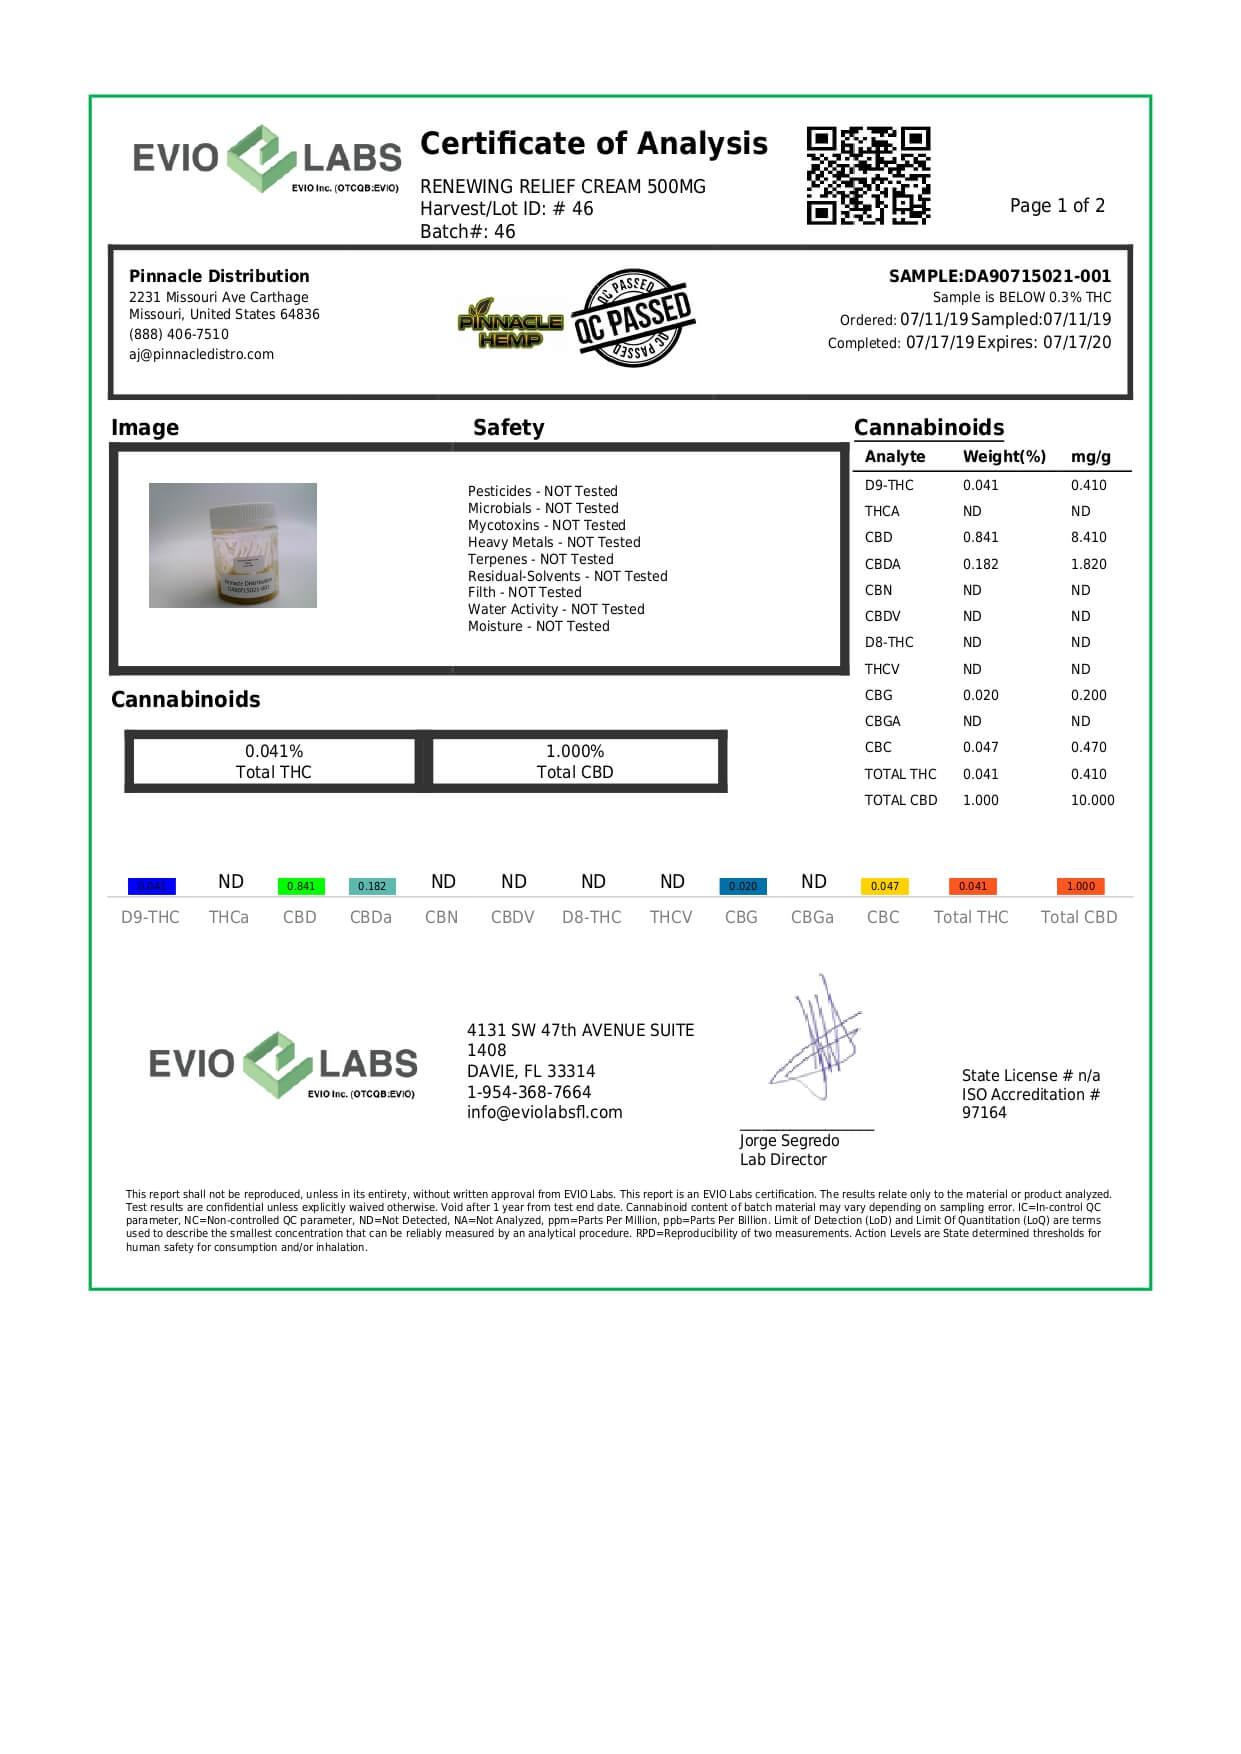 Pinnacle Hemp CBD Topical Relief Cream Renewing 500mg Lab Report